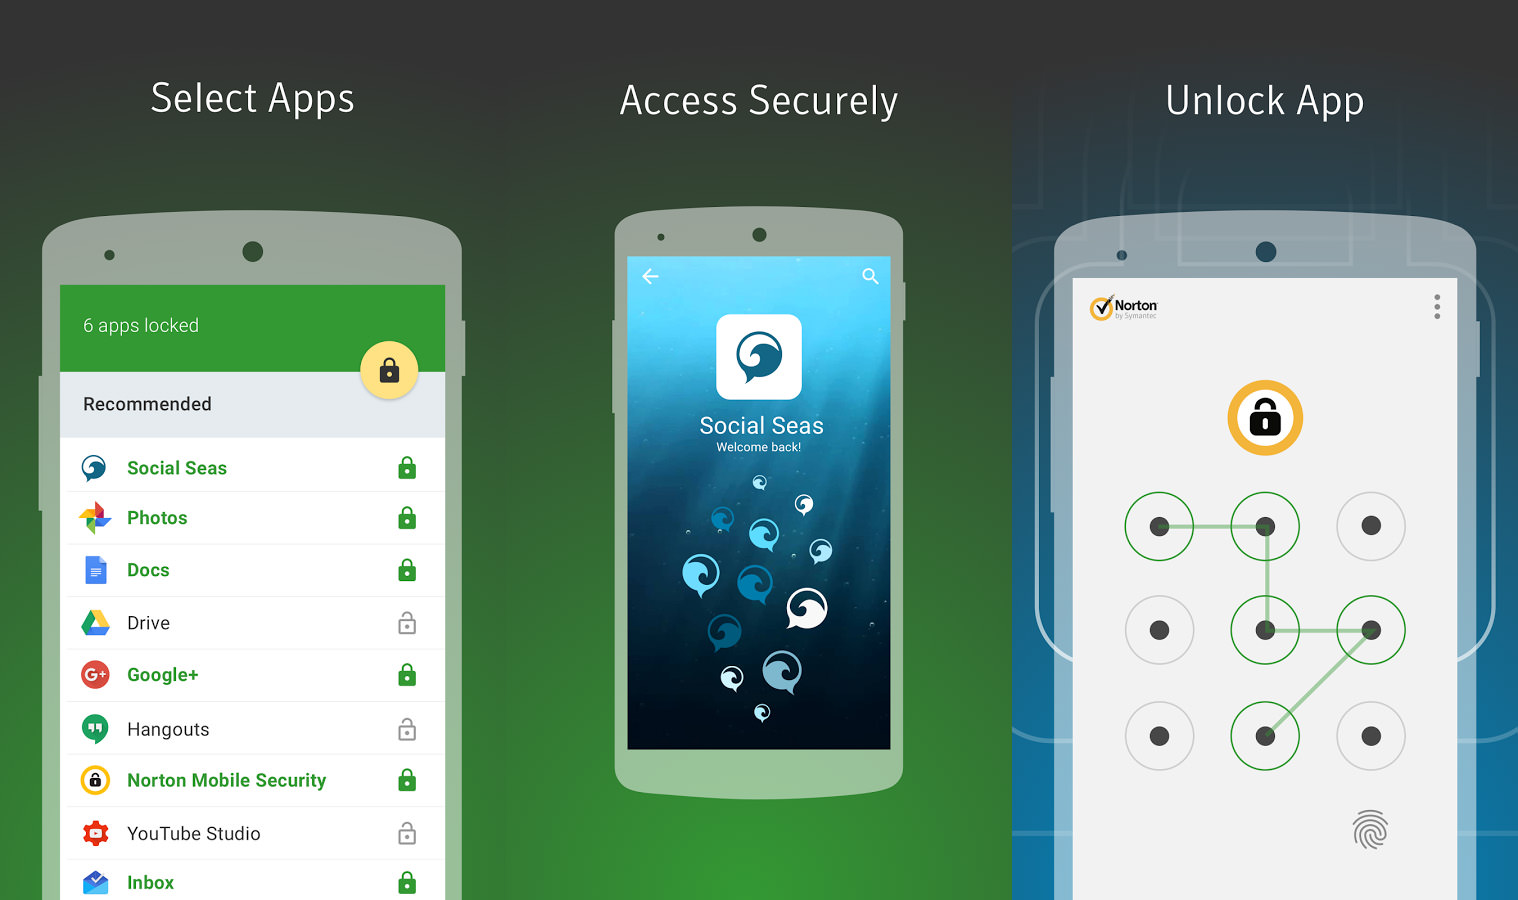 6 Apps To Password Lock Whatsapp, Facebook, WeChat, & FB